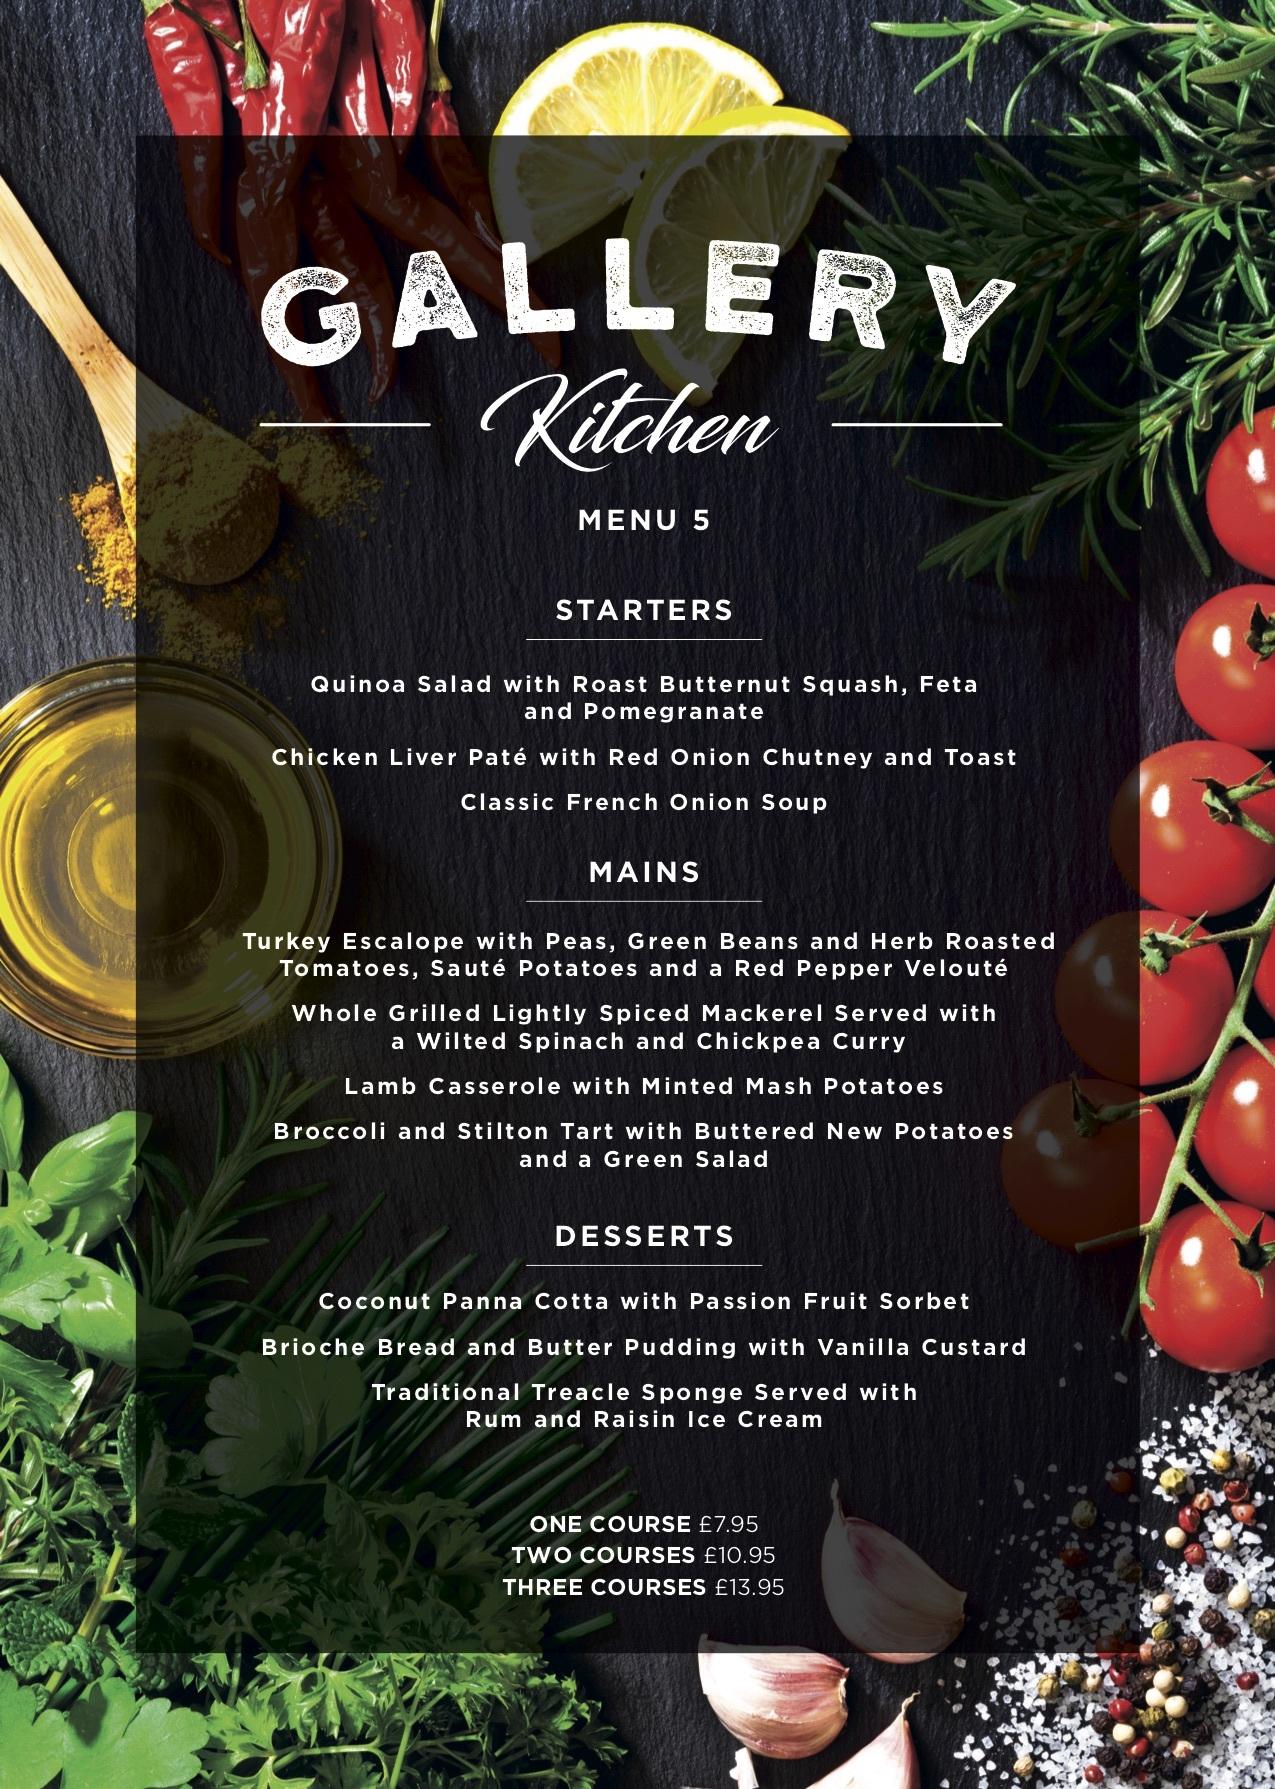 Gallery Restaurant Menu 5